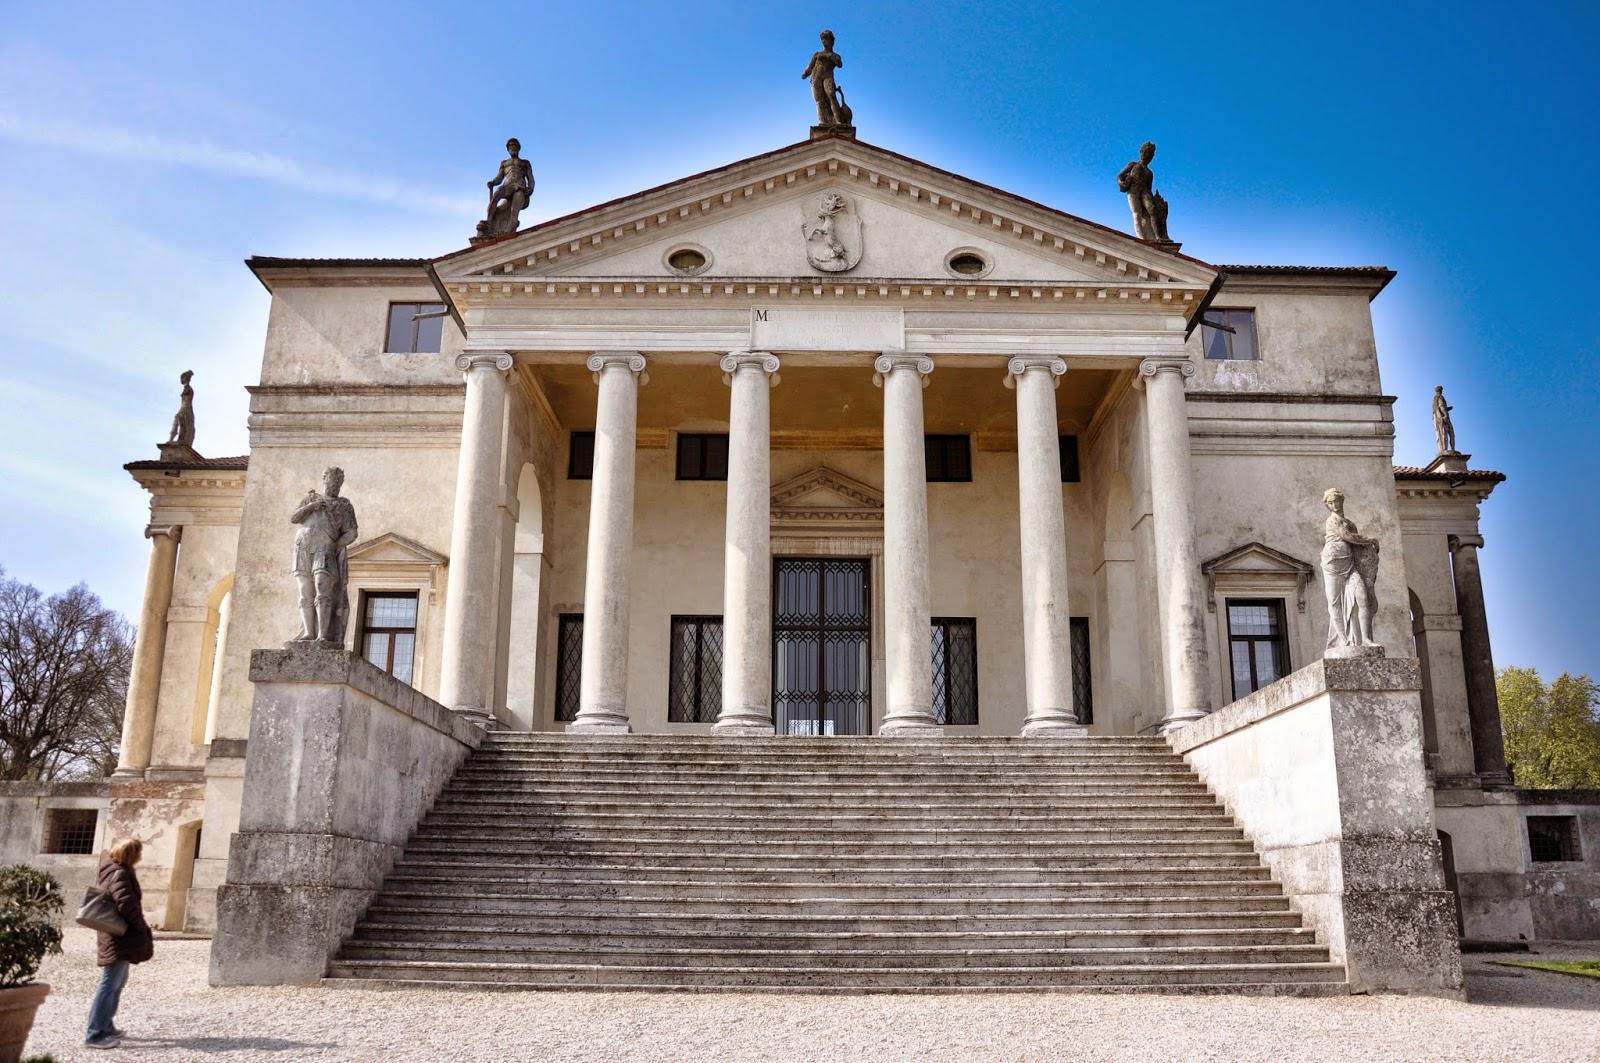 Villa Capra 'La Rotonda', Vicenza, Italy